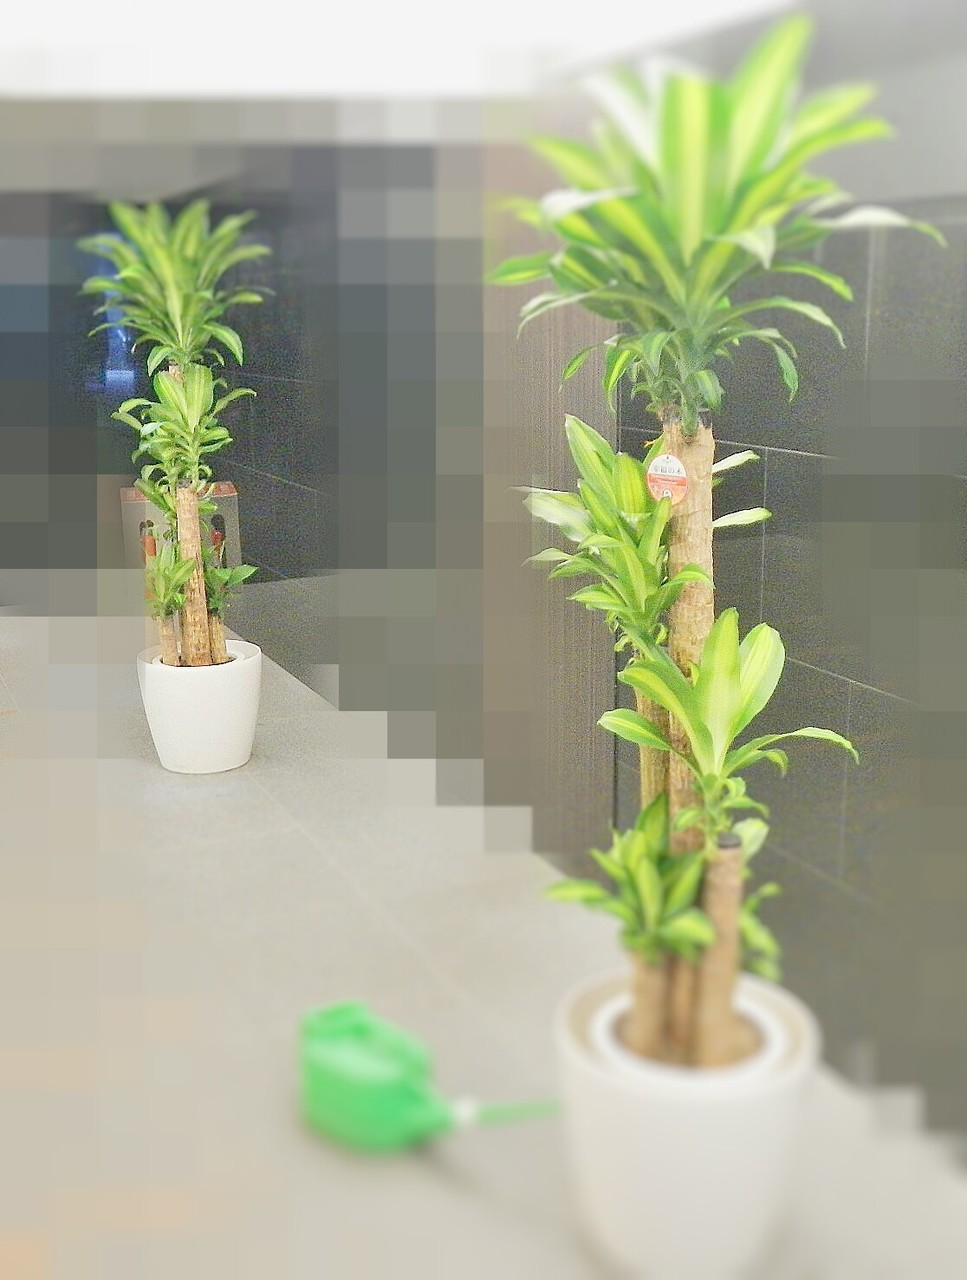 定期 観葉植物換え After